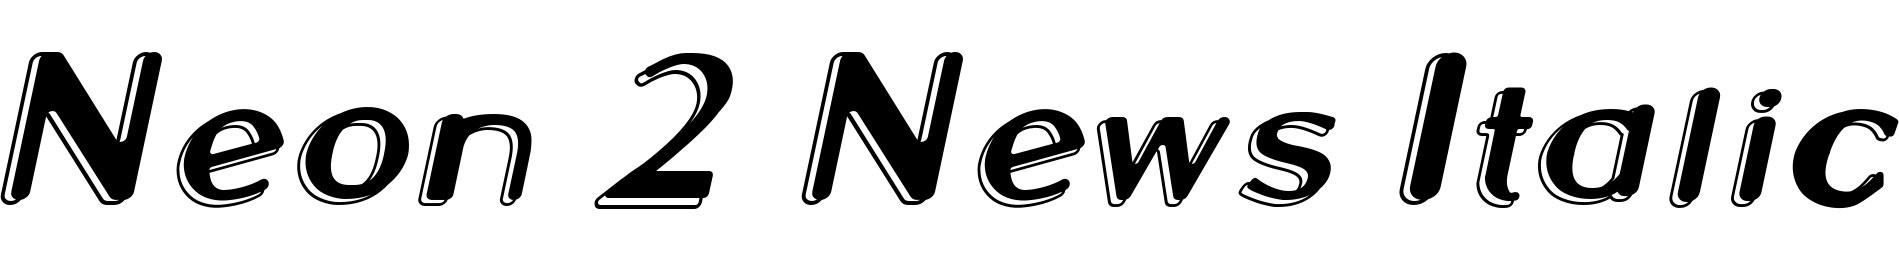 Neon 2 News Italic